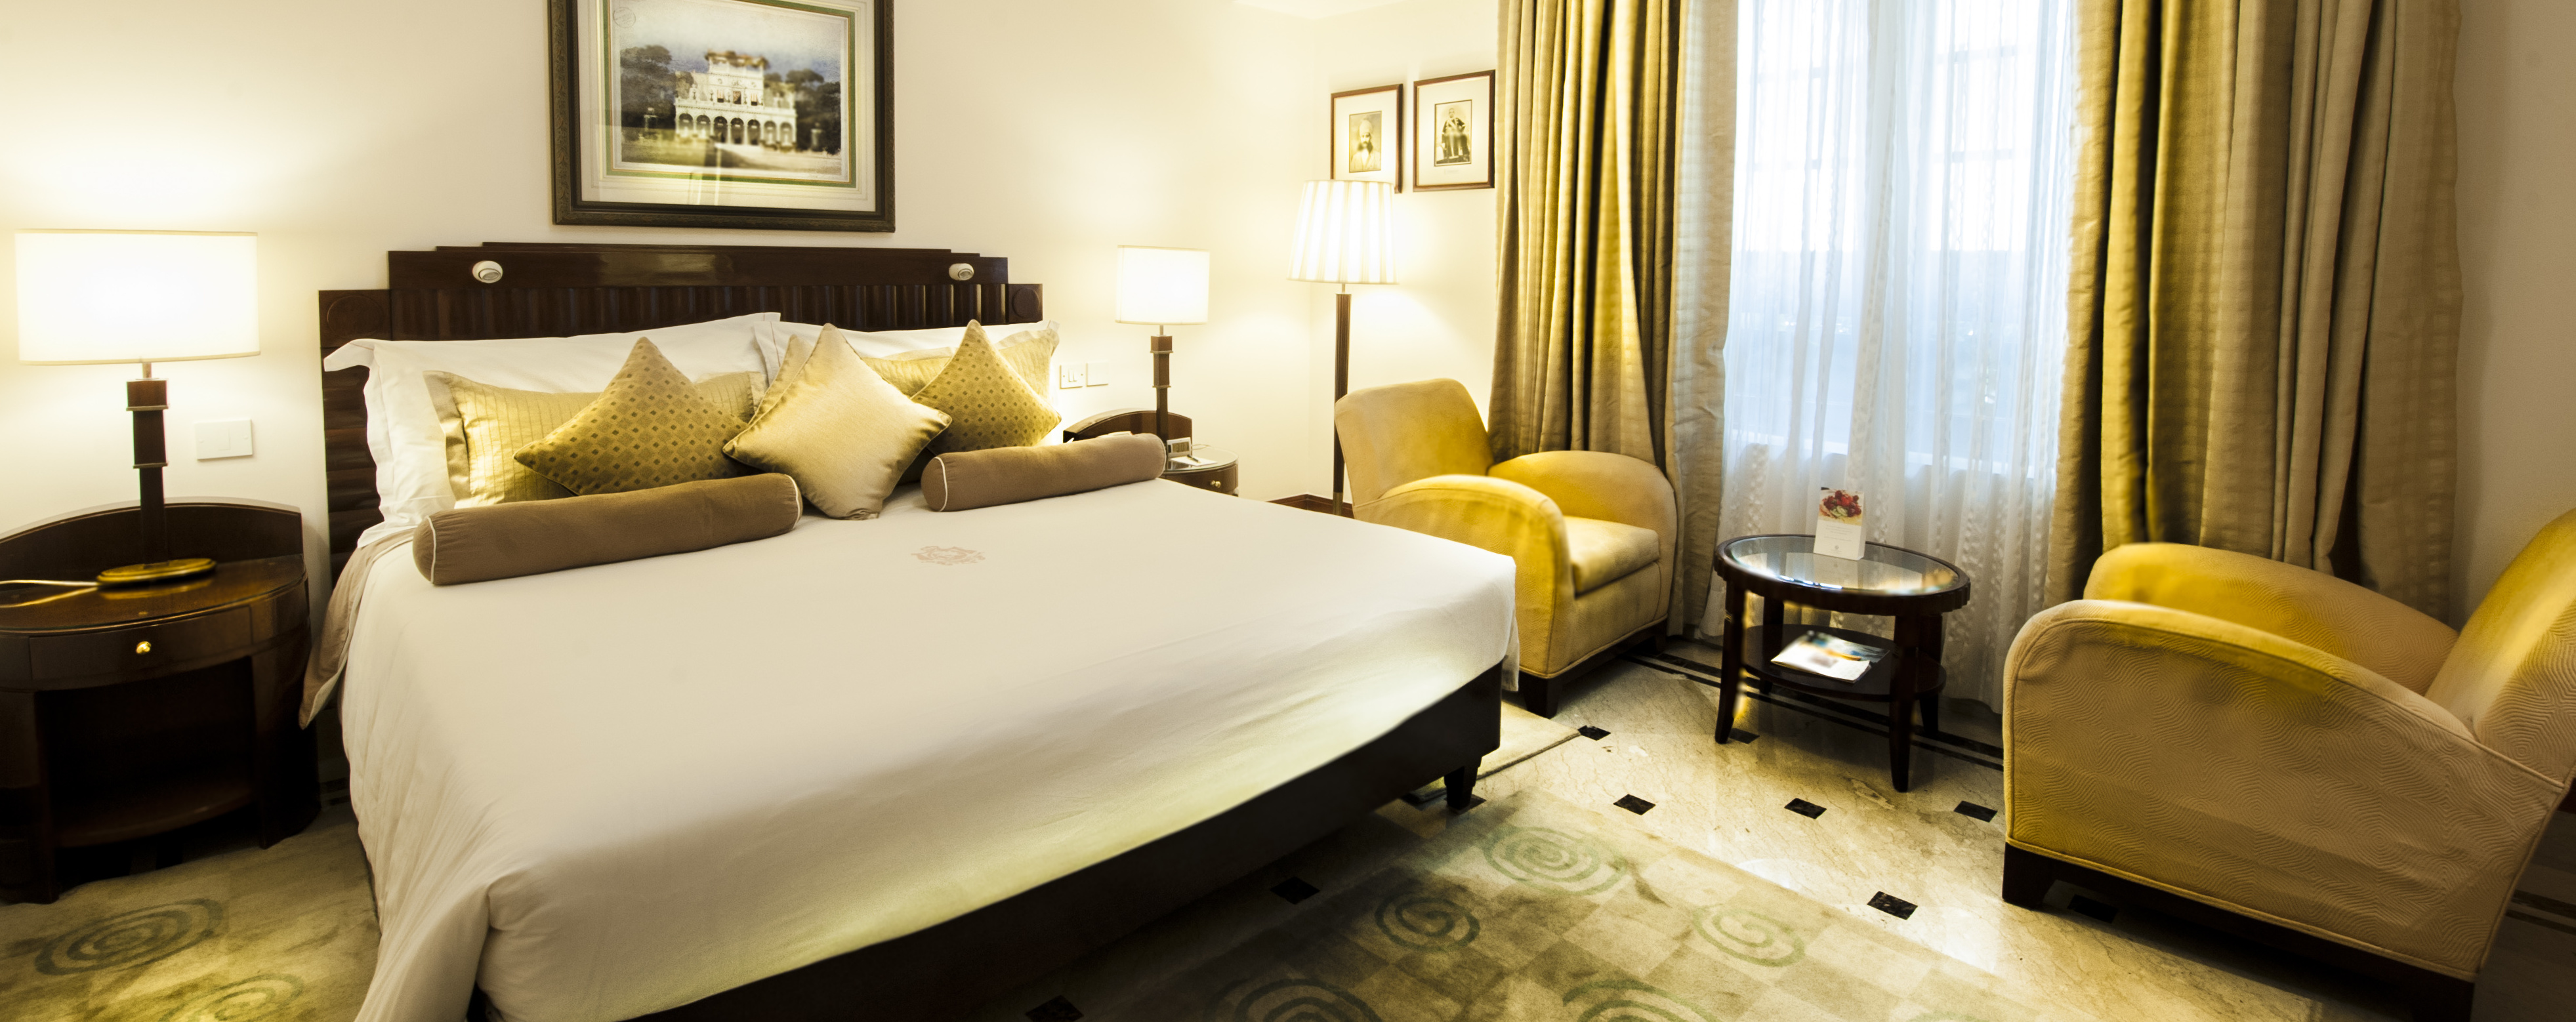 Deco-Room-Imperial-Delhi